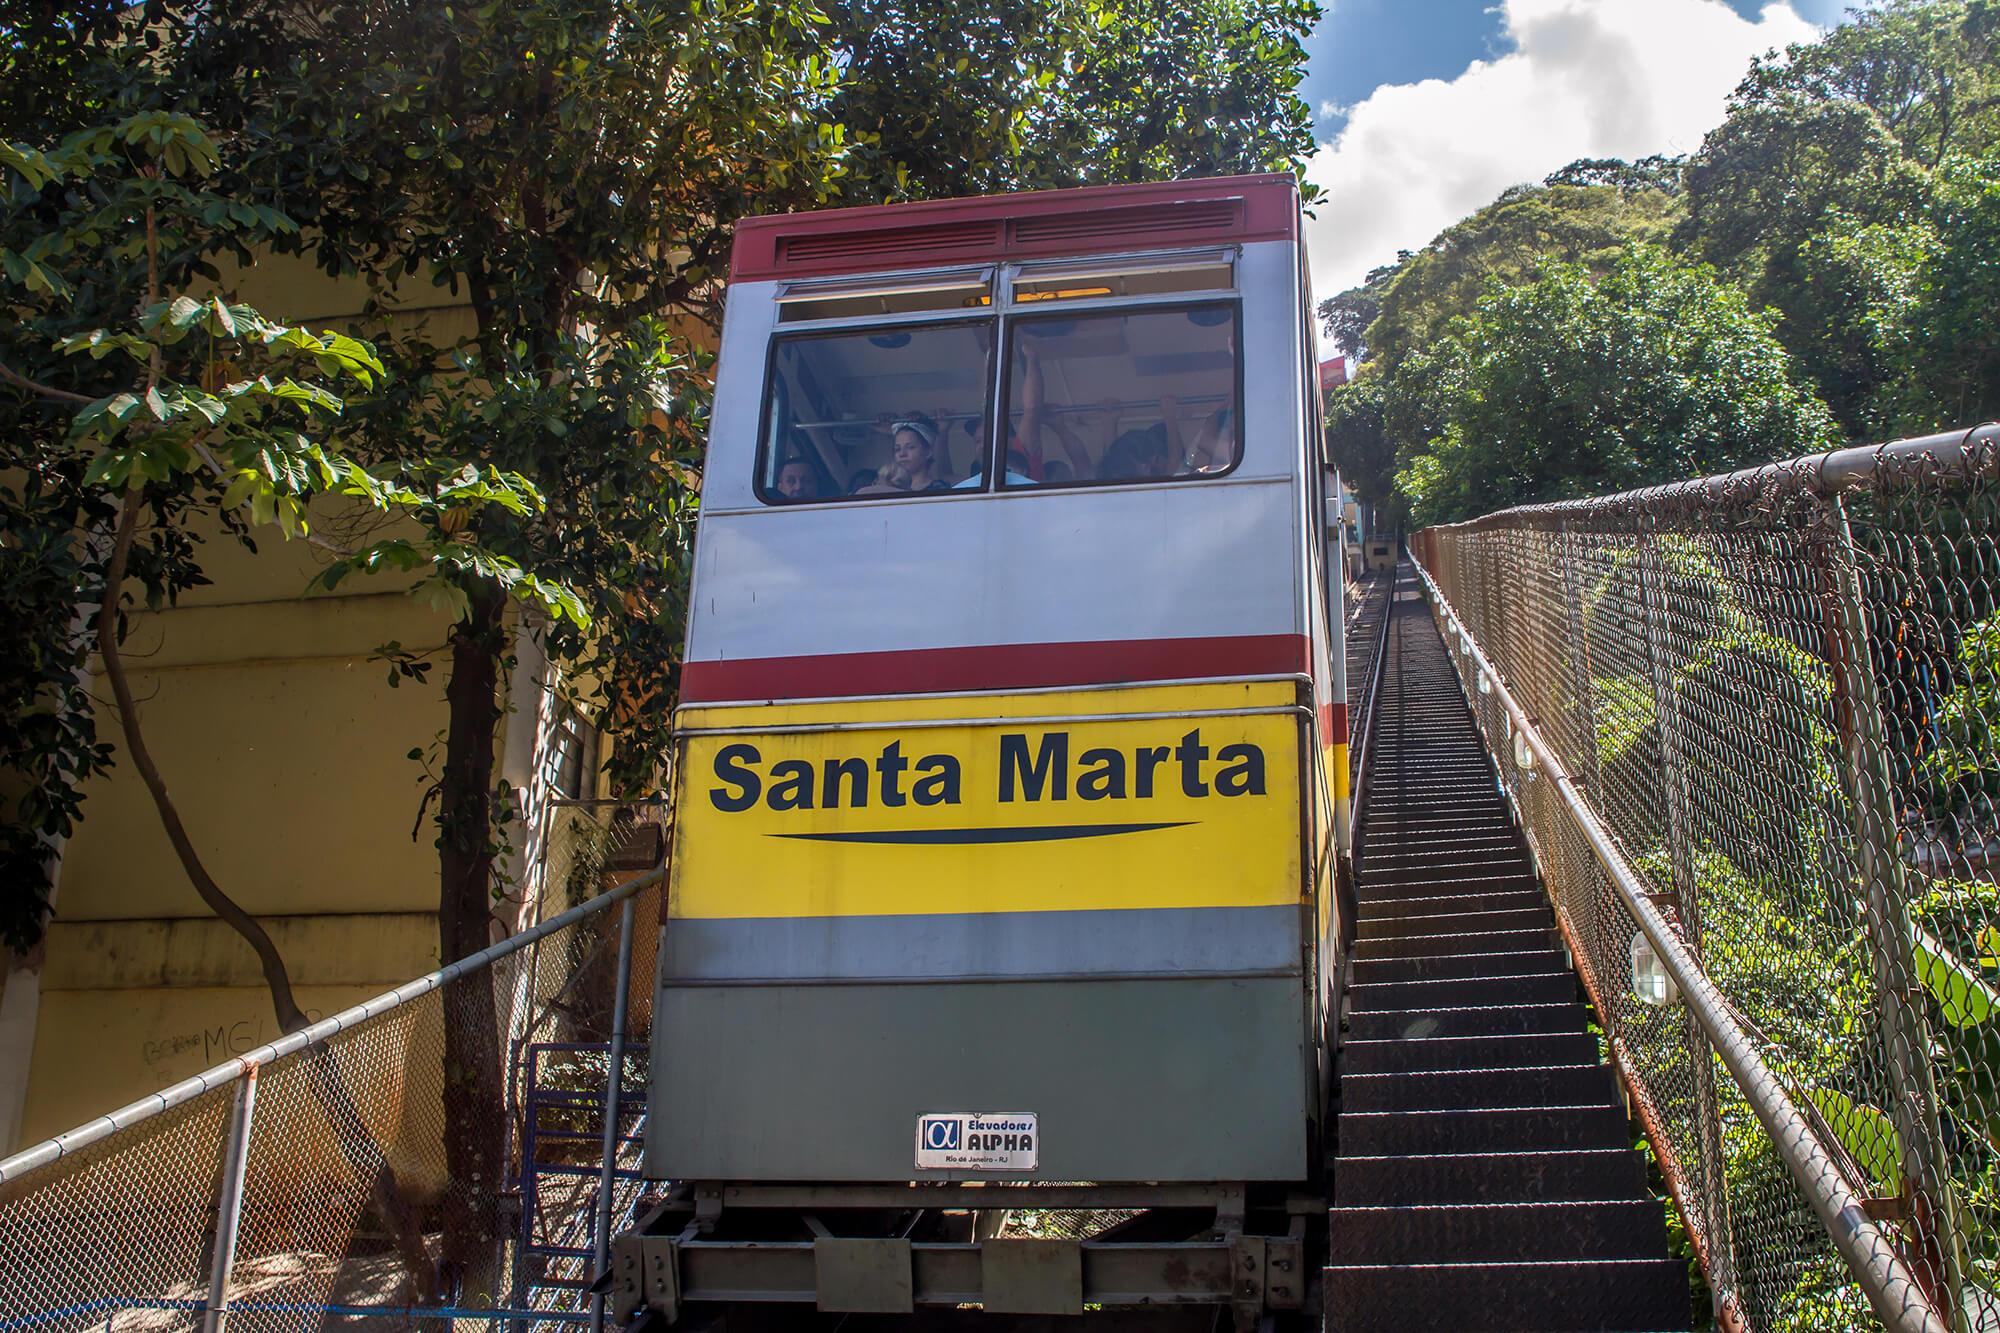 Santa-Marta-6